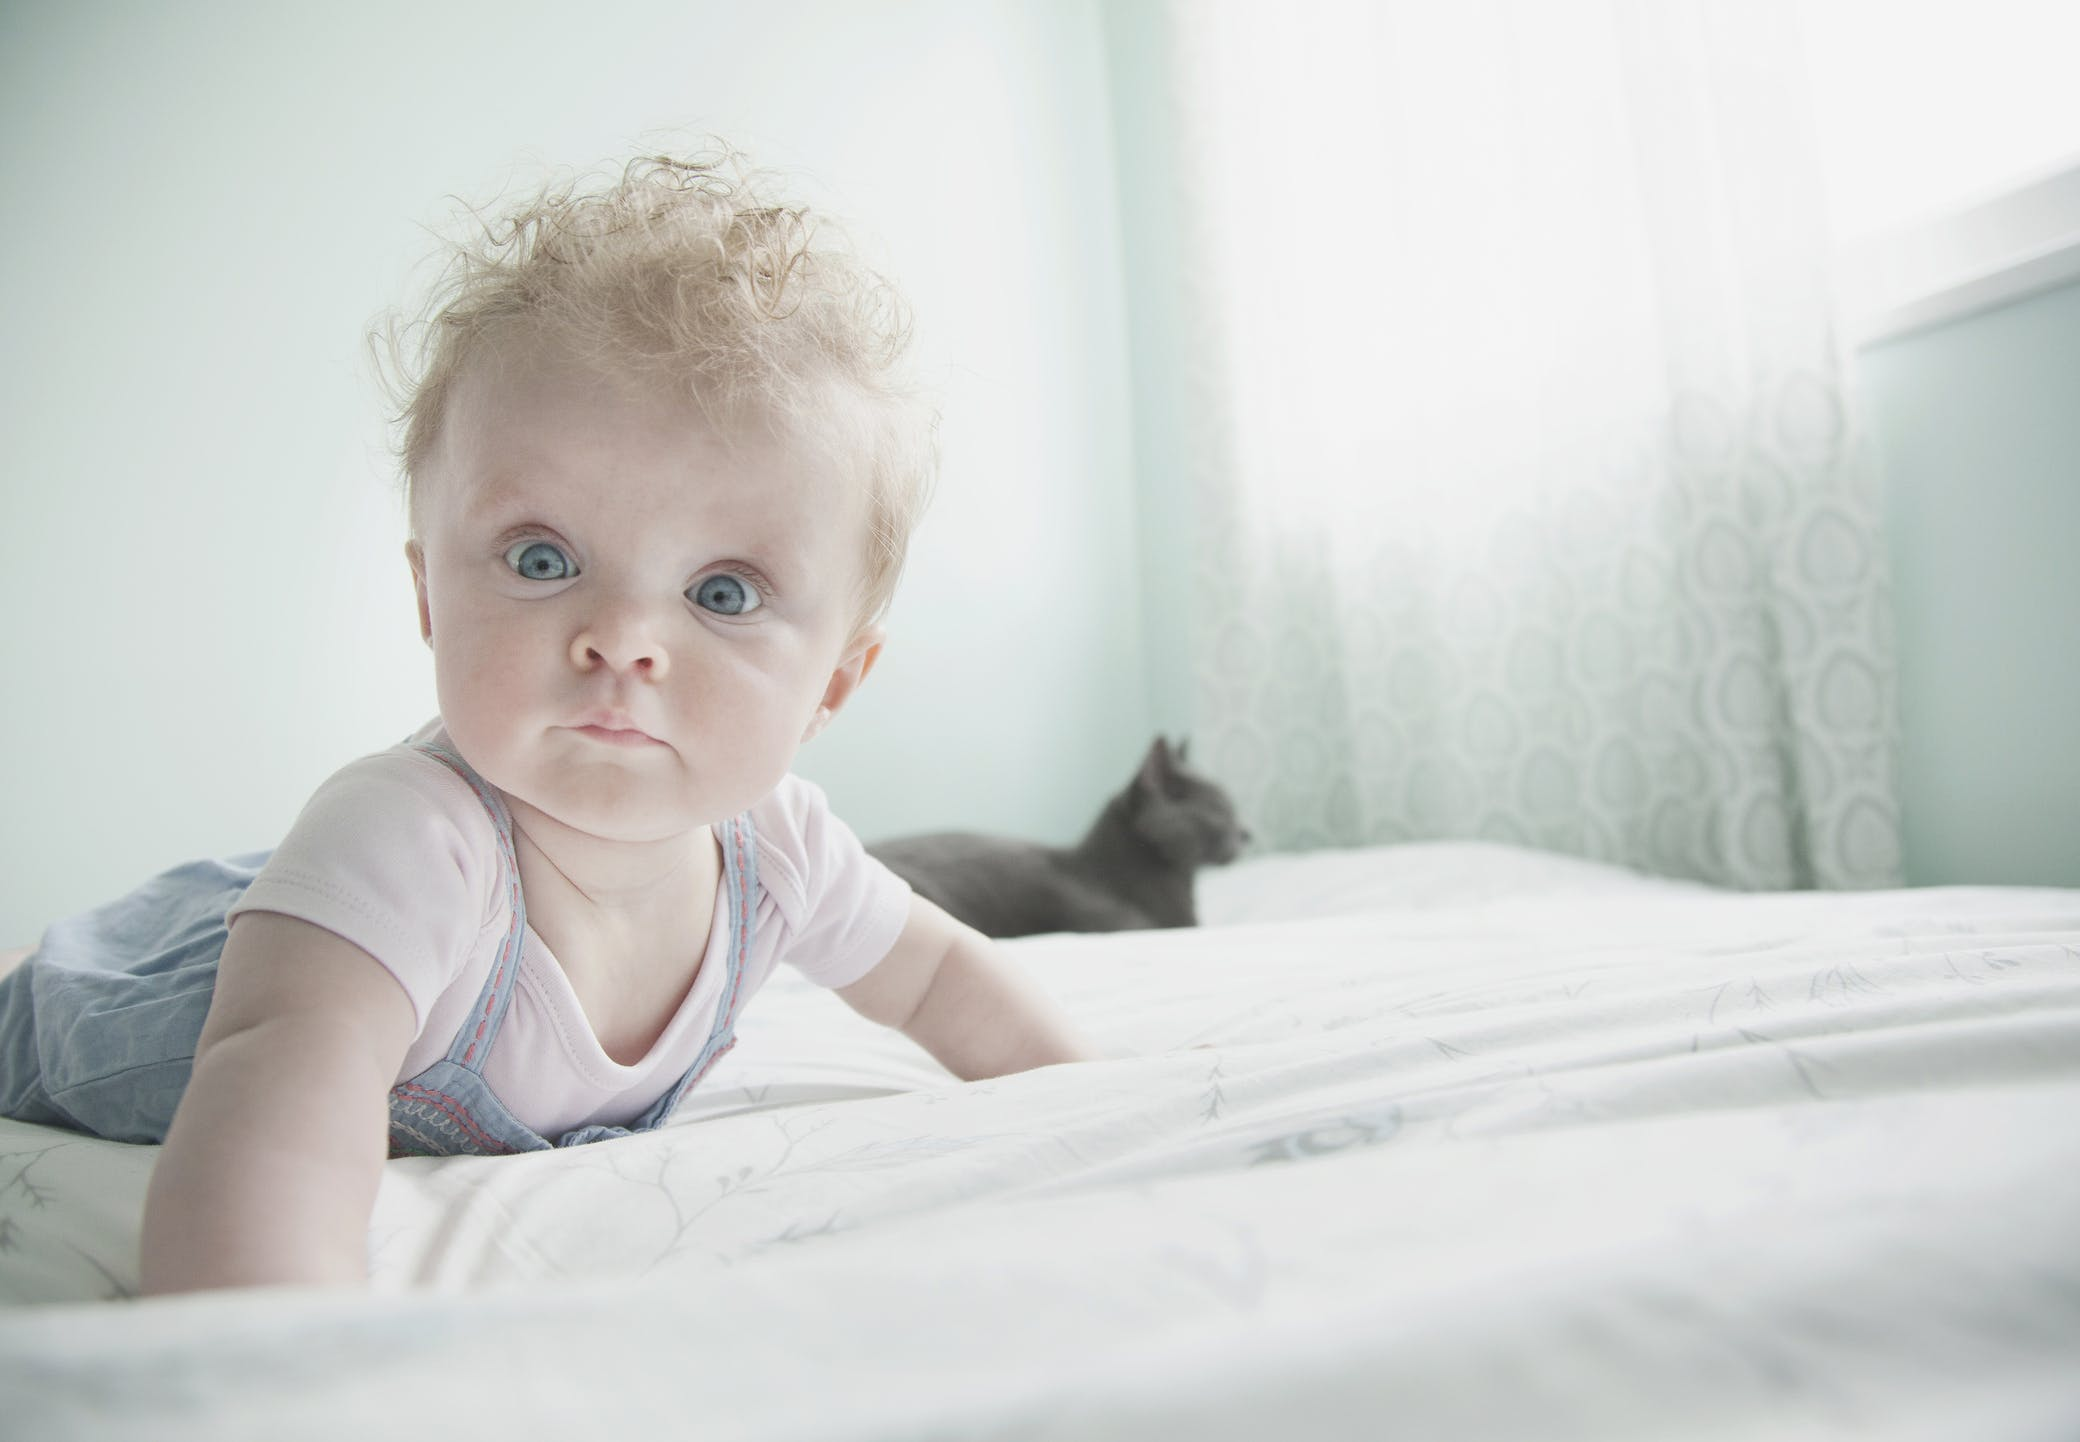 Baby with black cat.jpg?ixlib=rails 3.0